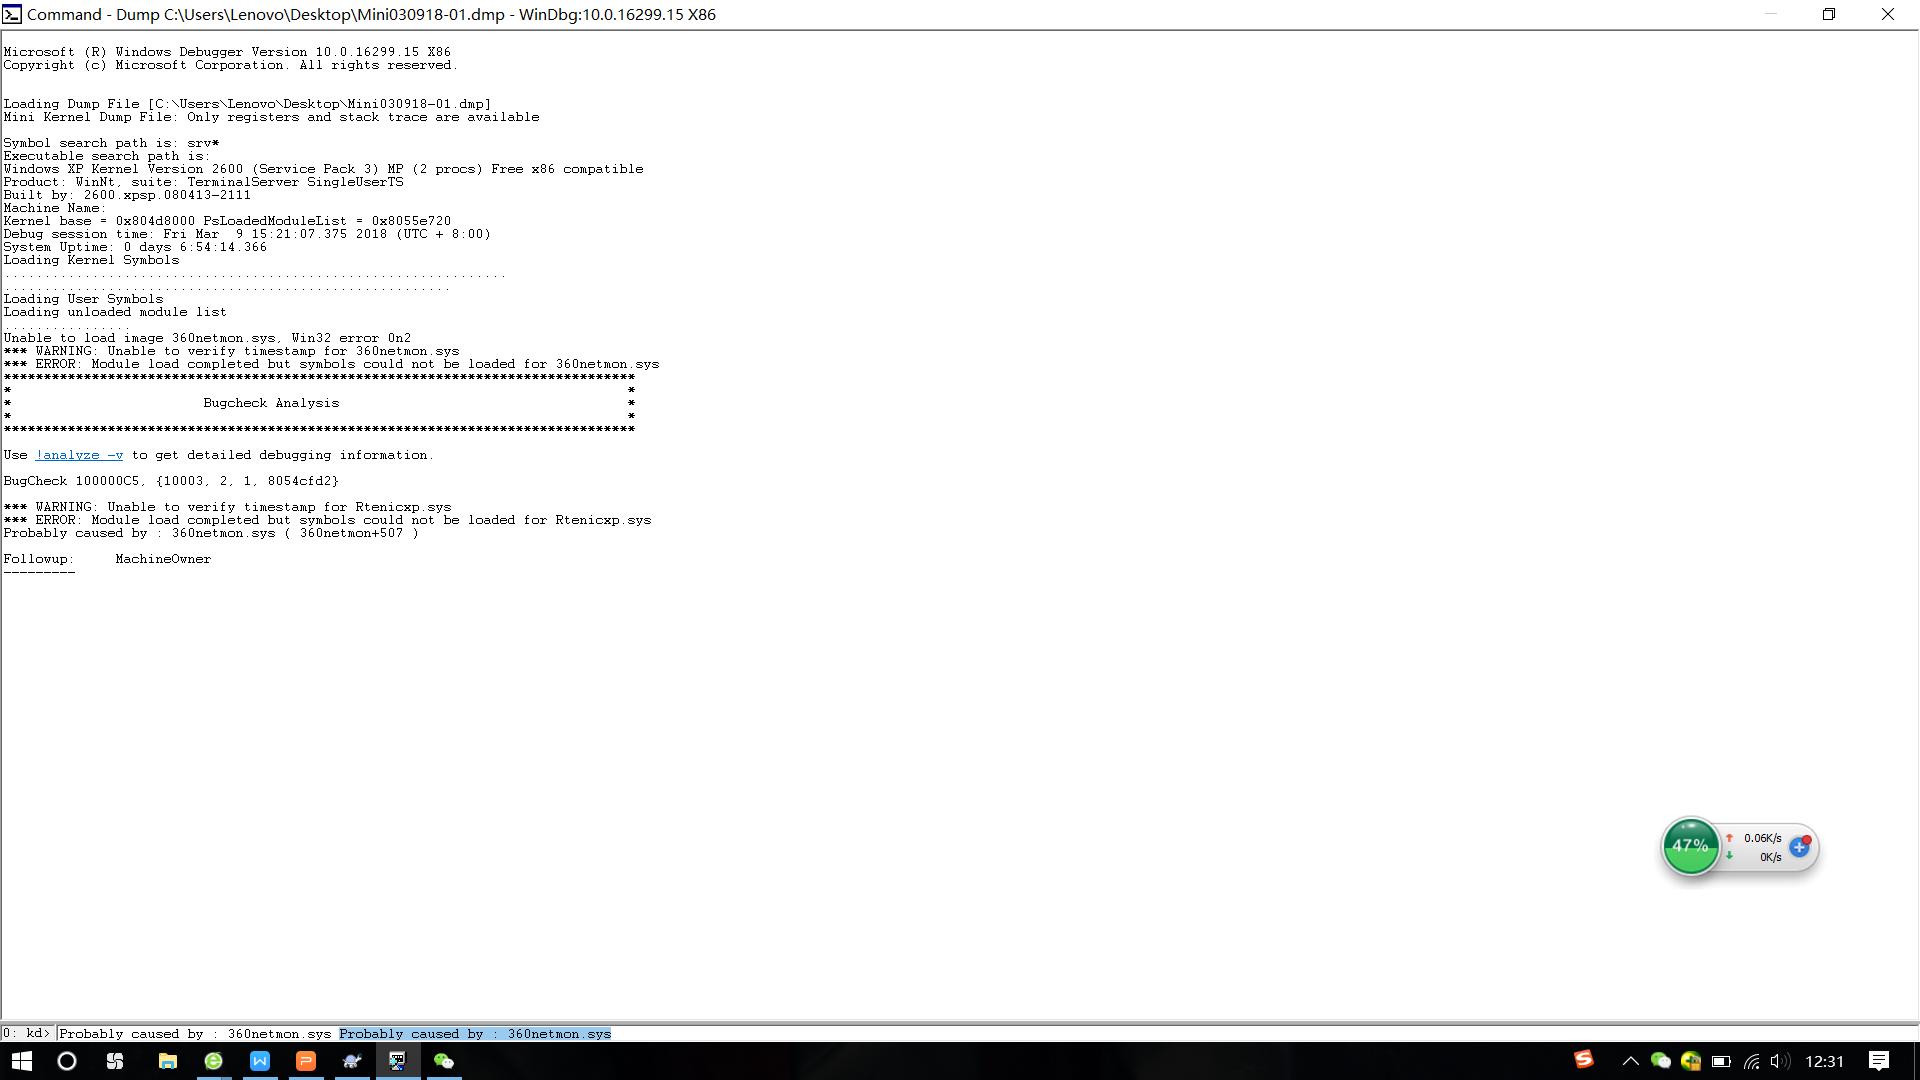 loadingdumpfile[c:userslenovodesktopmini03091801.